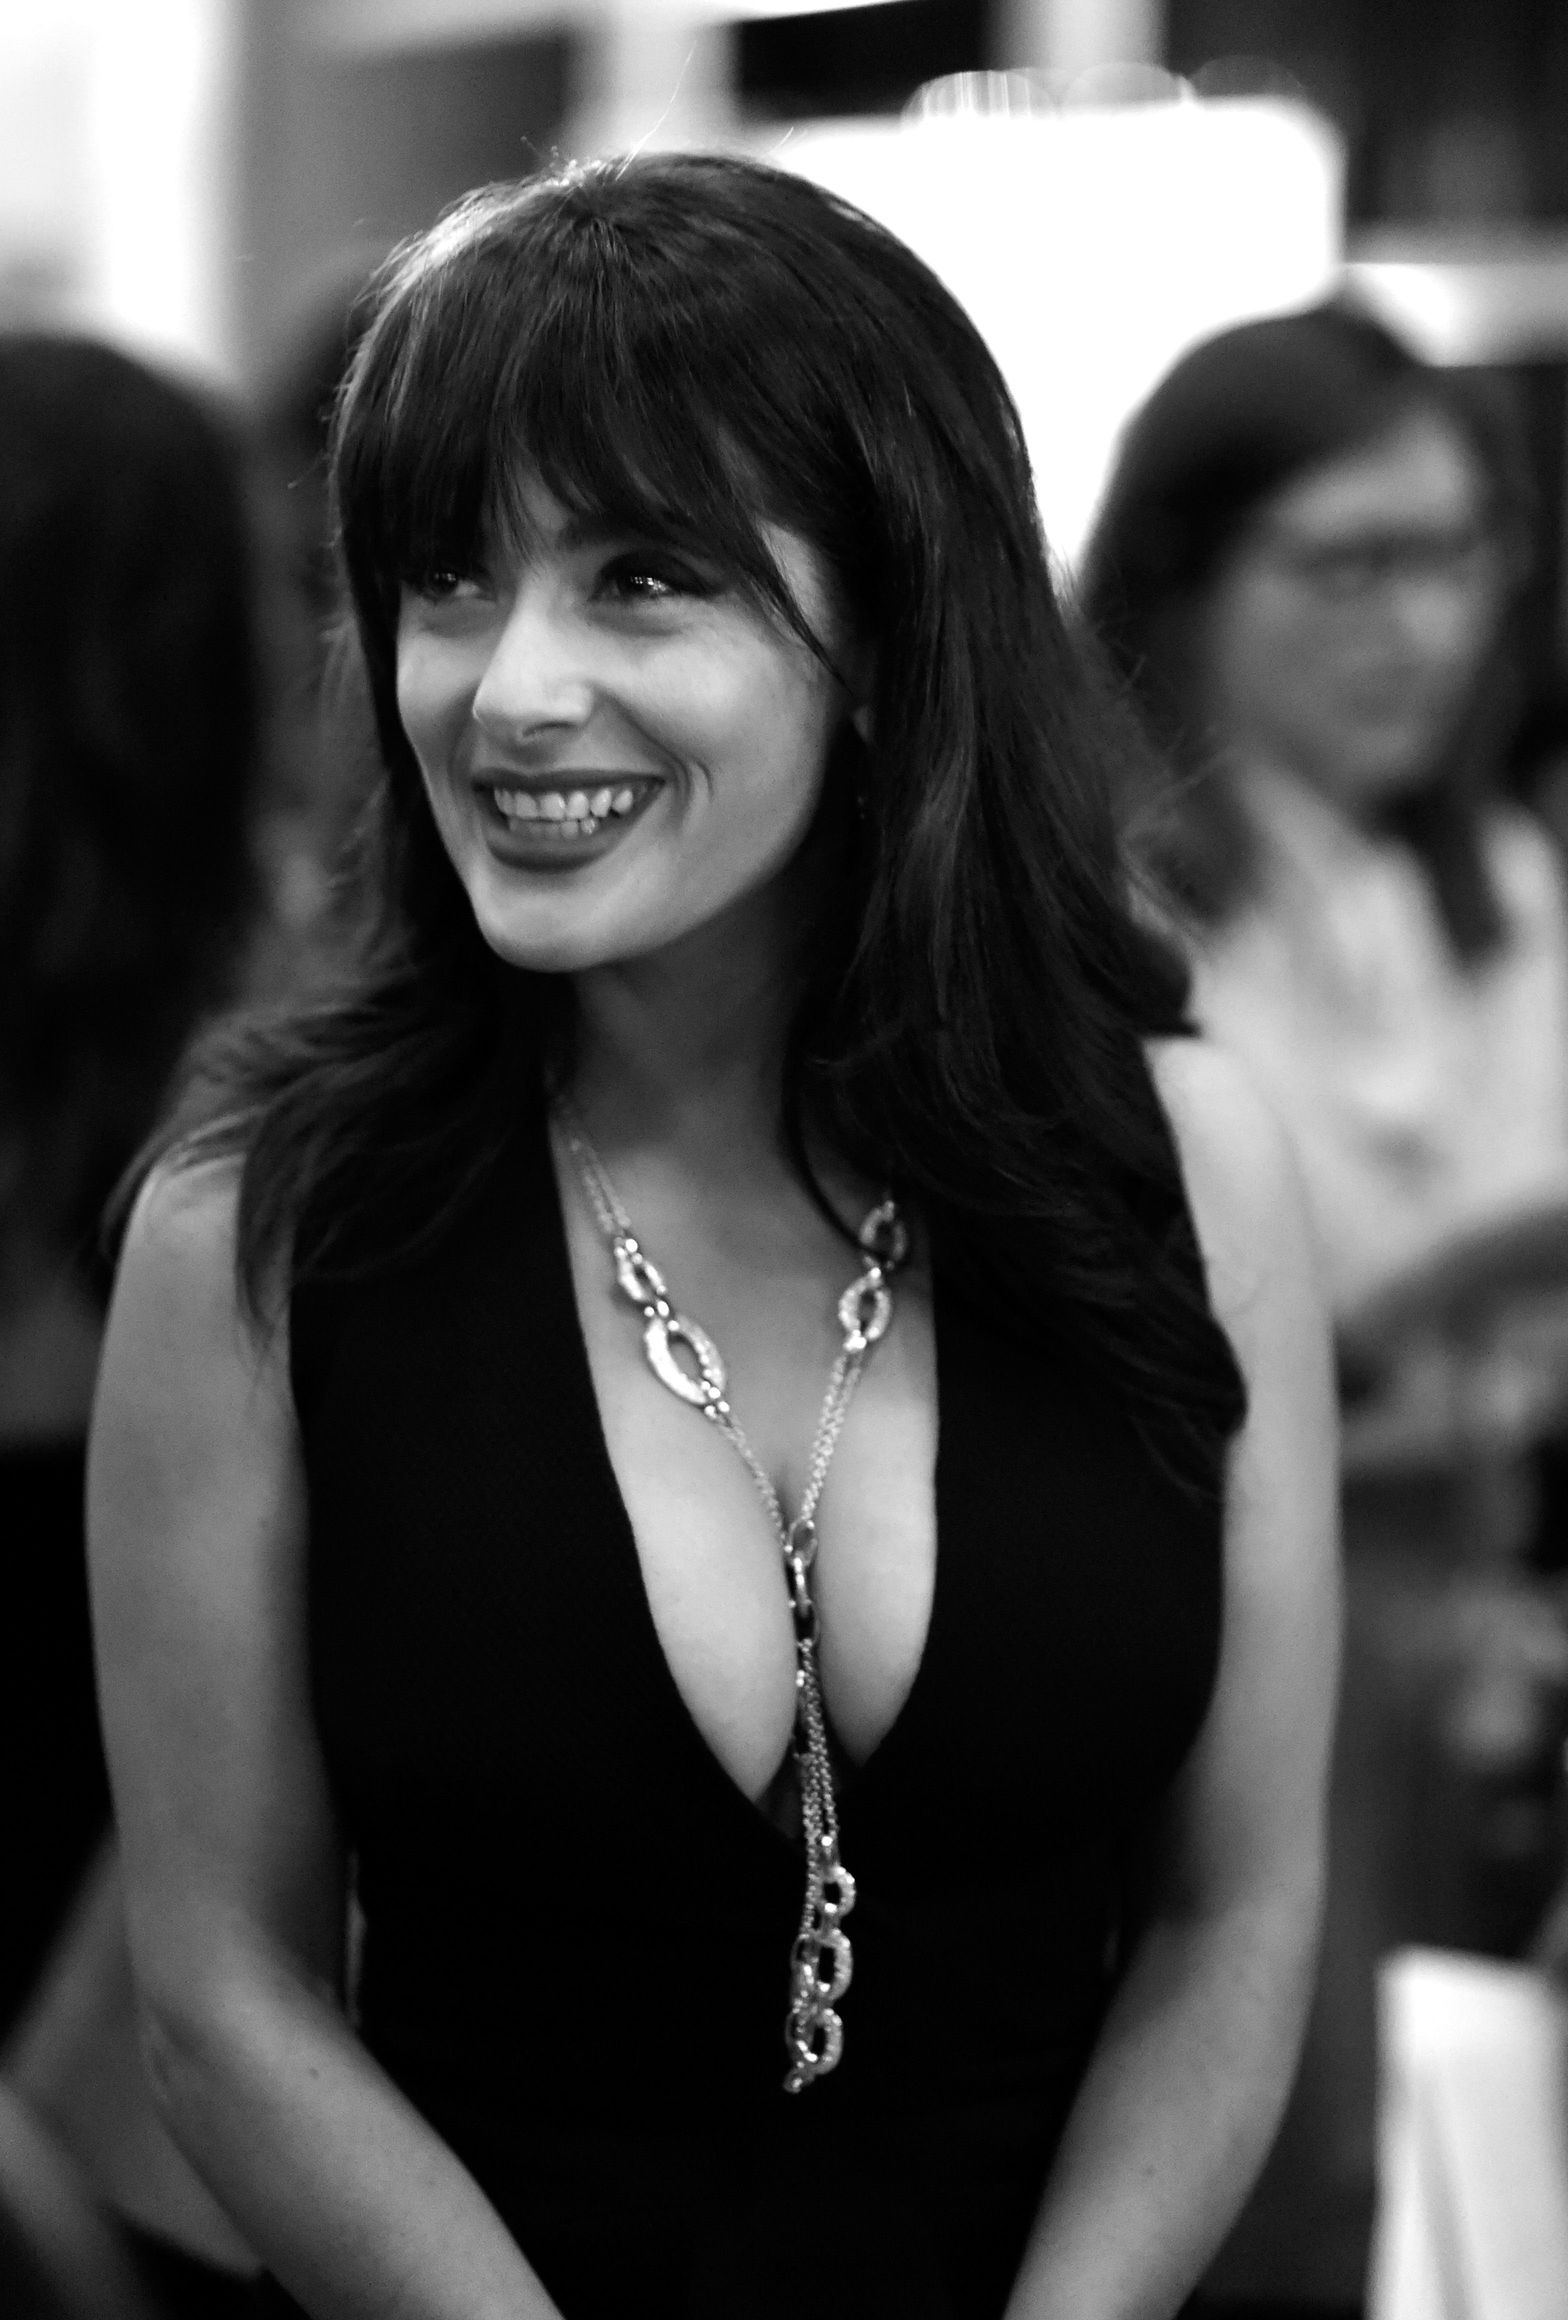 Salma Hayek Cleavage (17 Photos)